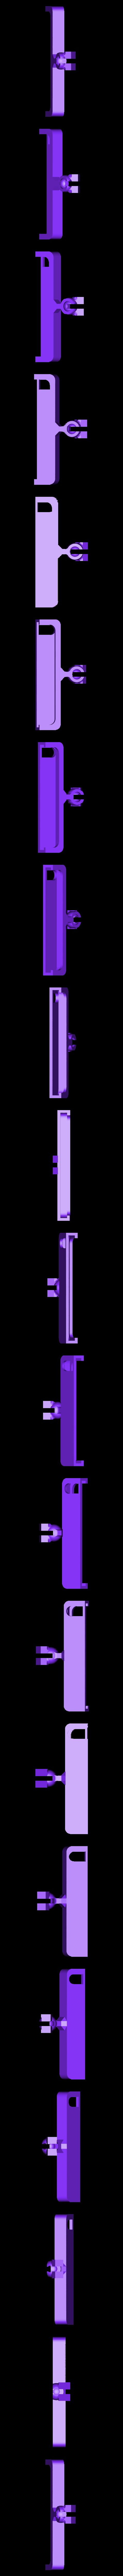 Porte_Iphone_rotuleV2.STL Download free STL file Iphone holder for Cage modular DSLR • Design to 3D print, vanson